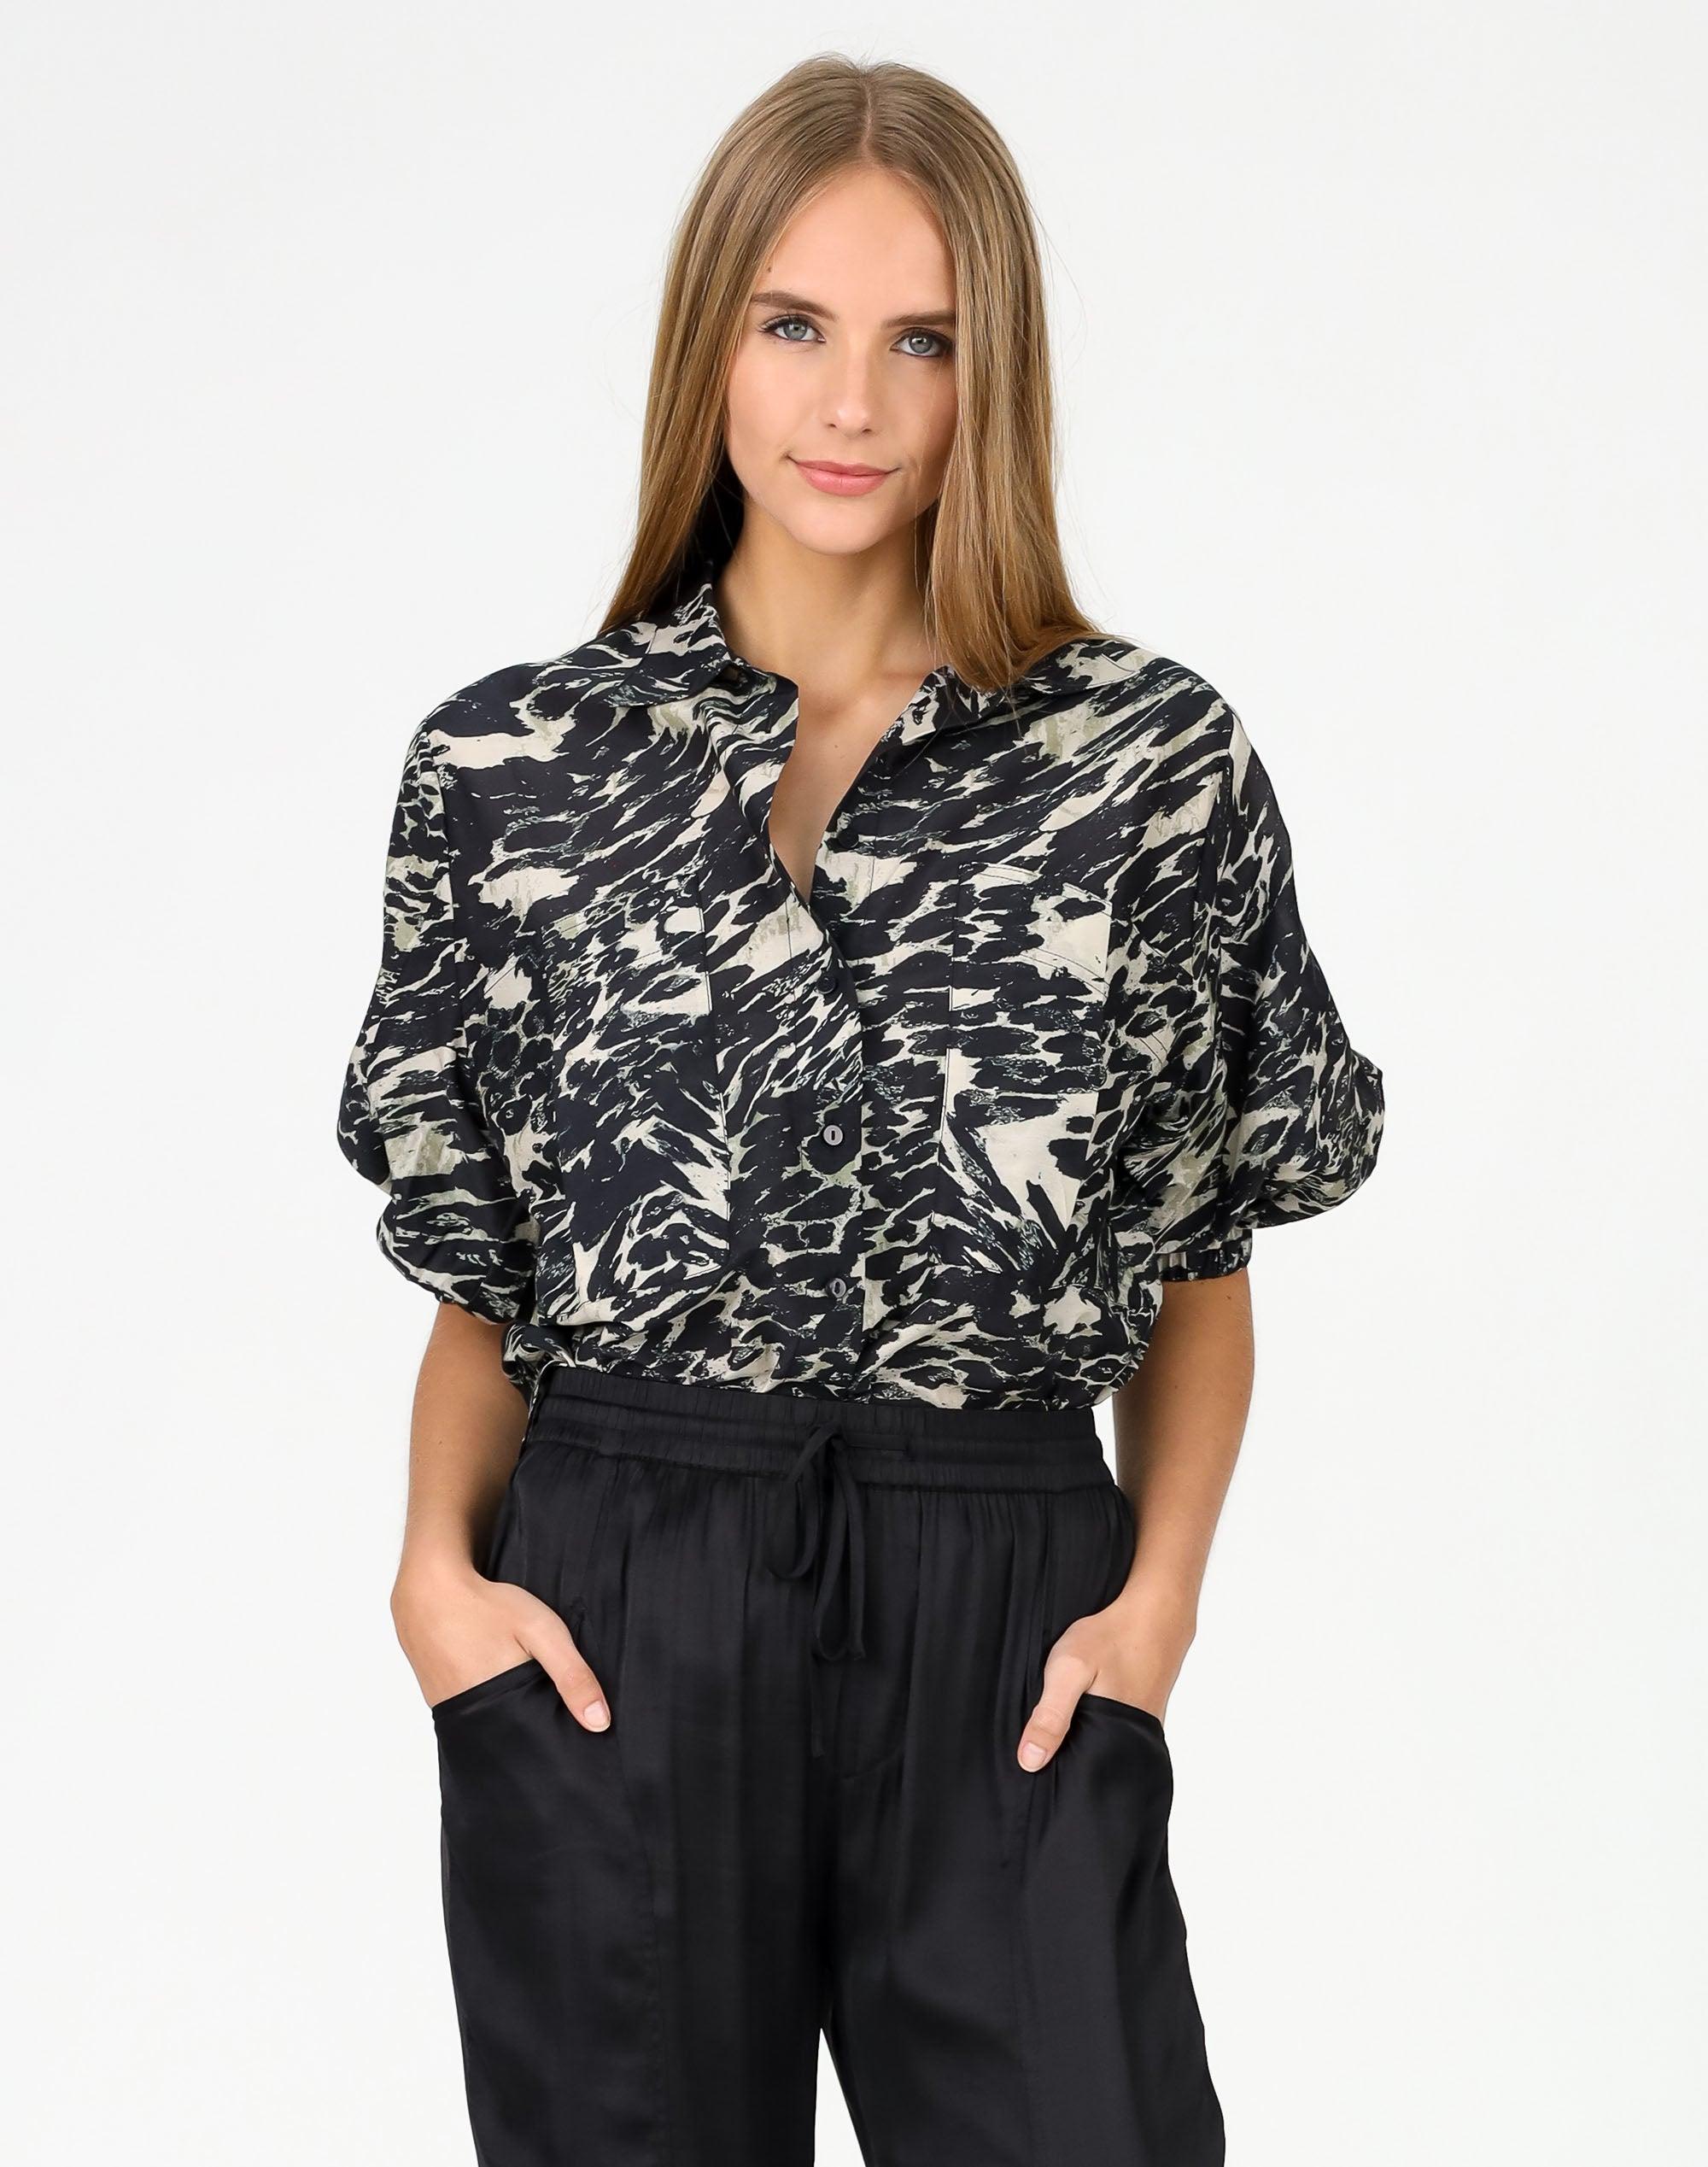 Mista Print Shirt